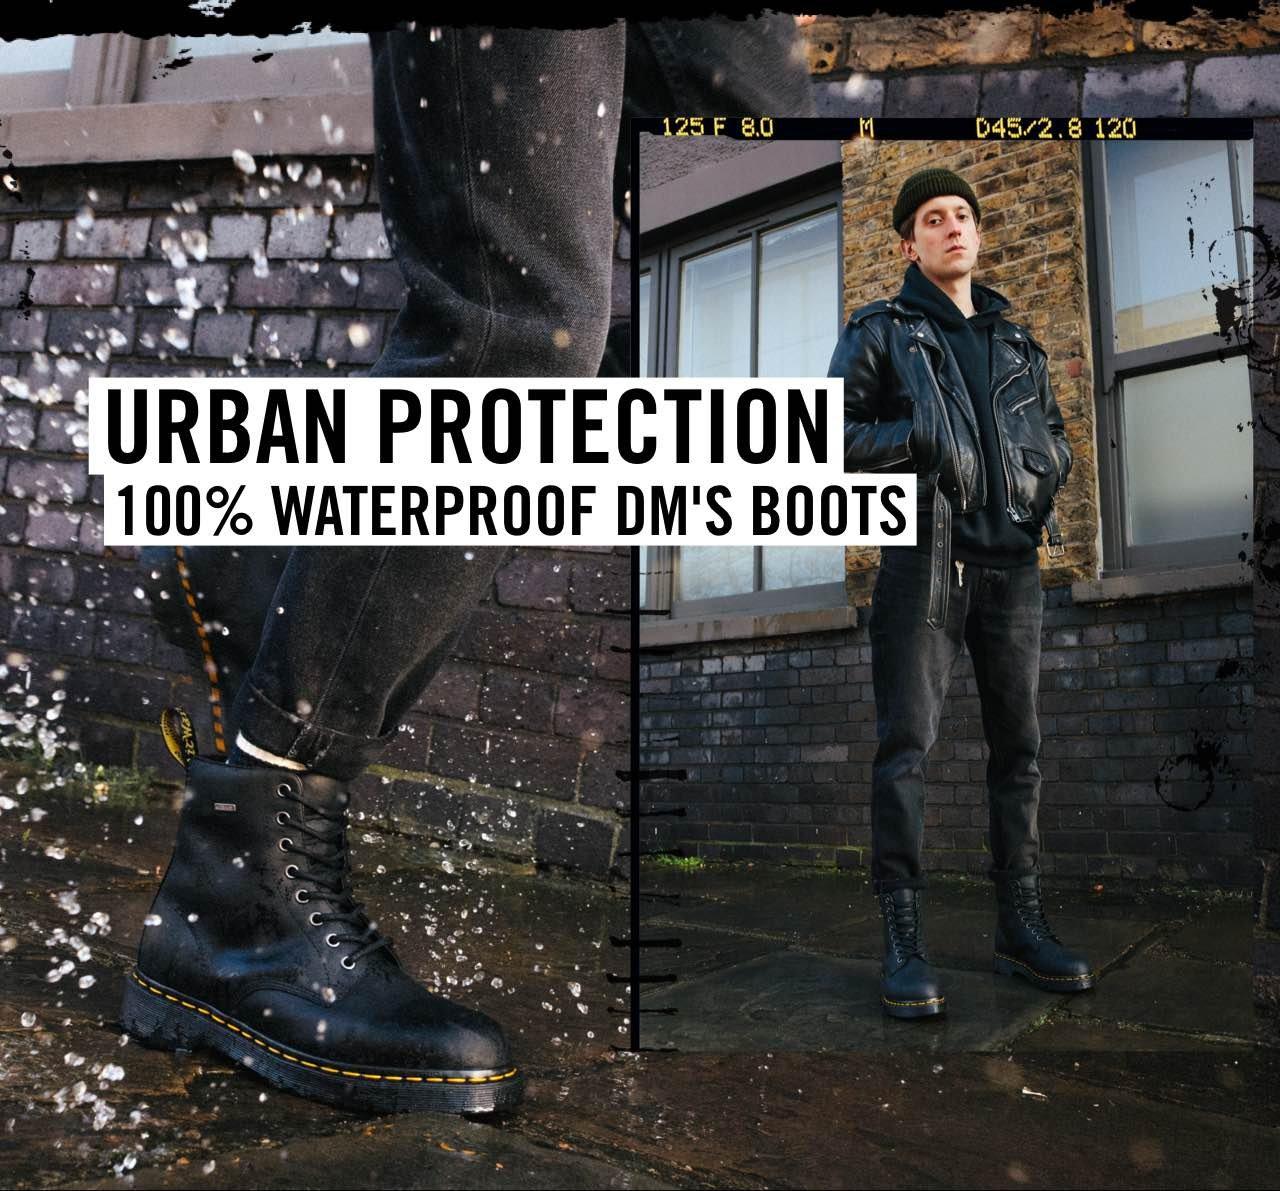 URBAN PROTECTION